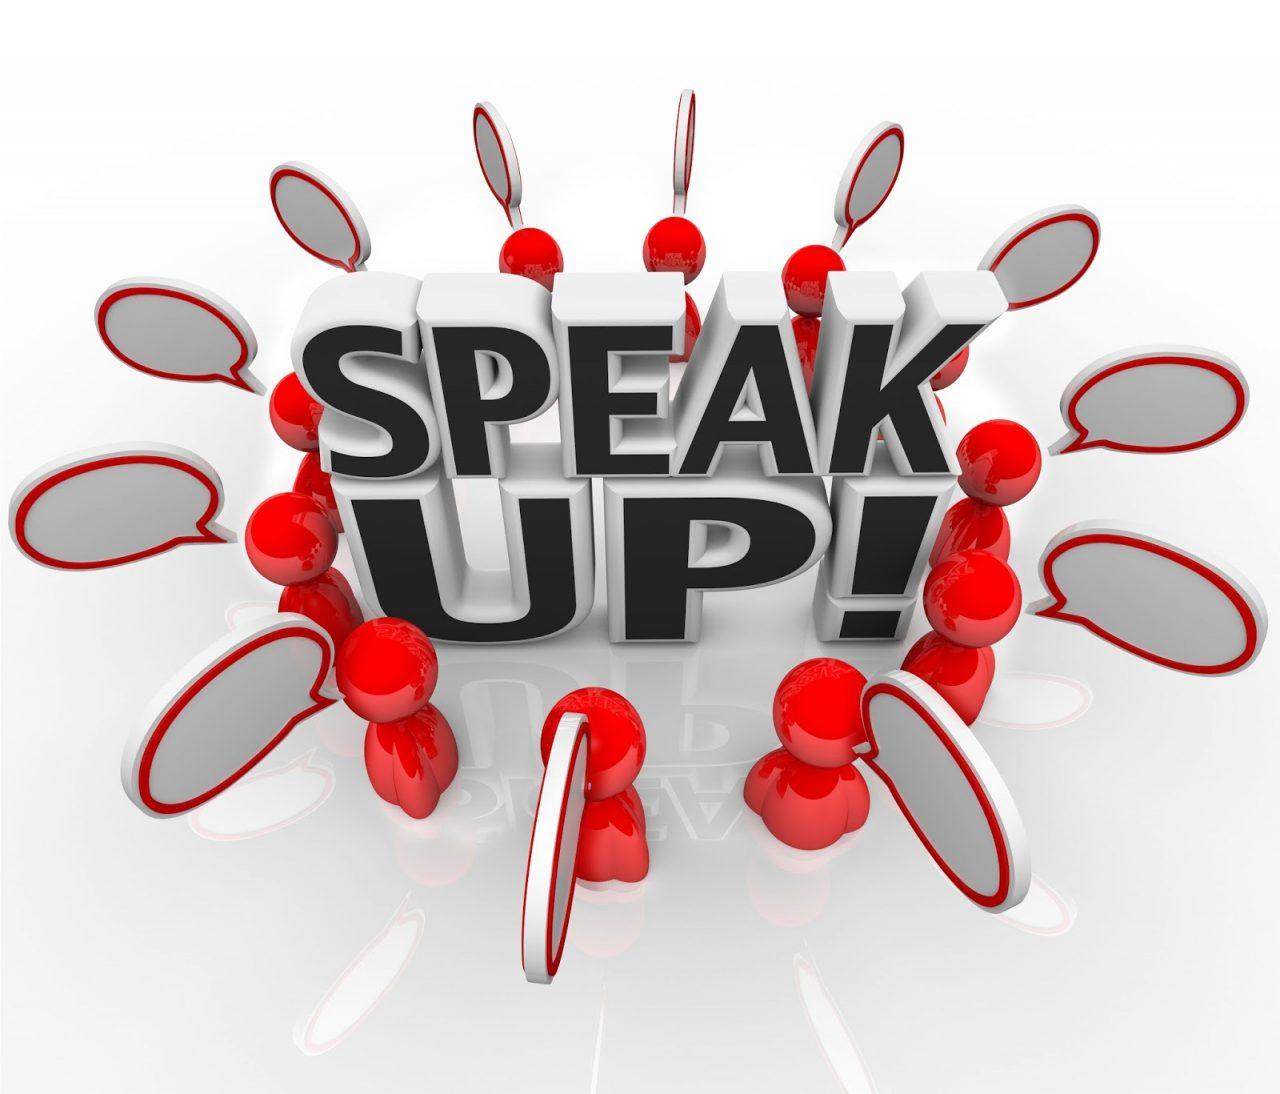 people speak up Courtesy of iQonceptShutterstockcom_93951835